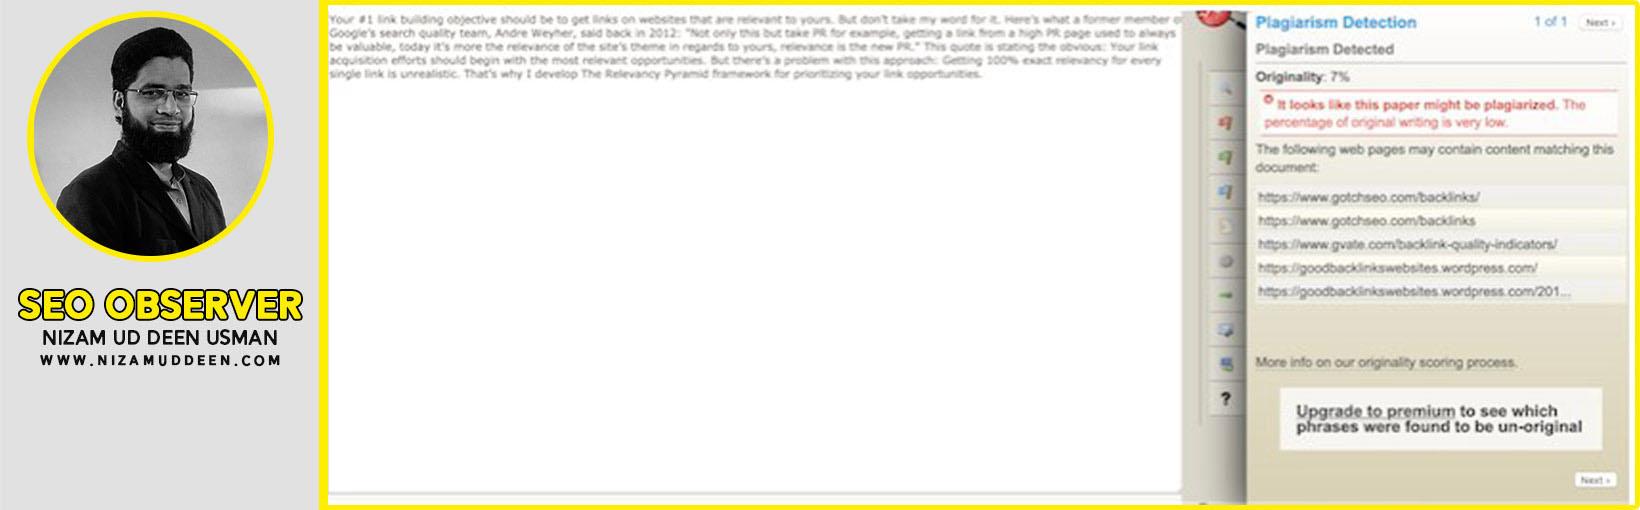 PaperRater Plagiarism Detection